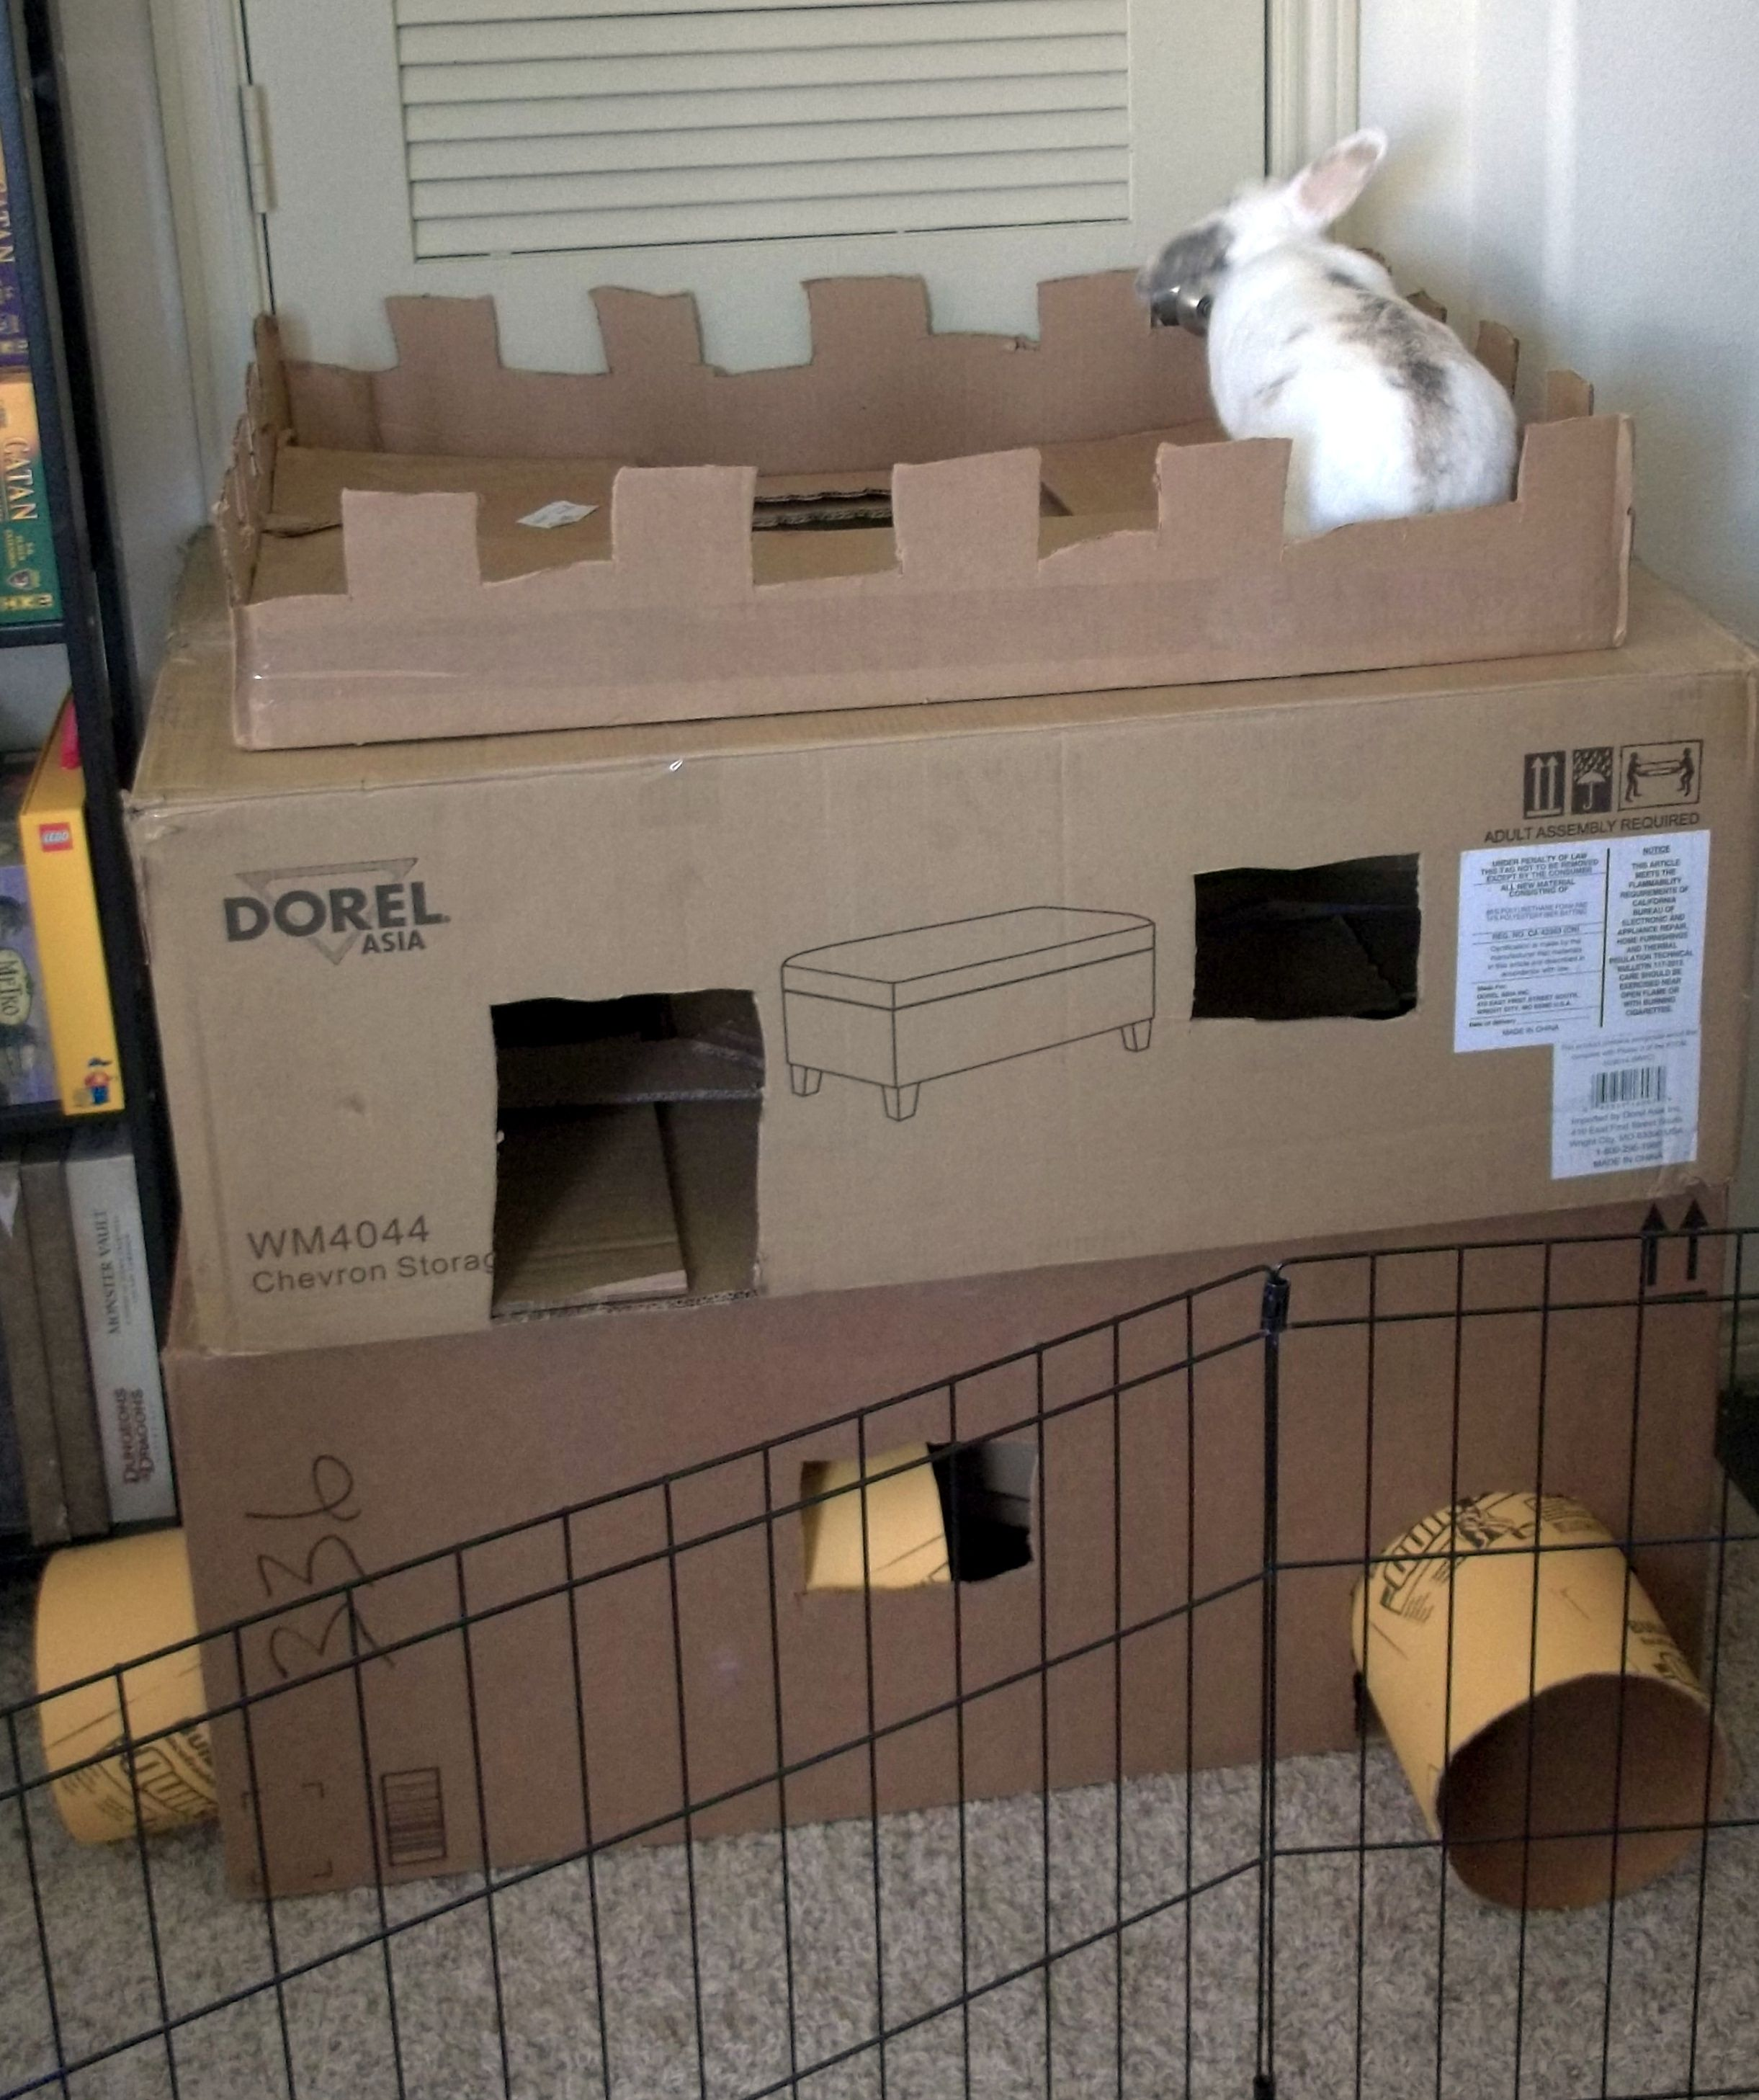 New Cardboard Castle For Radar Bunny!